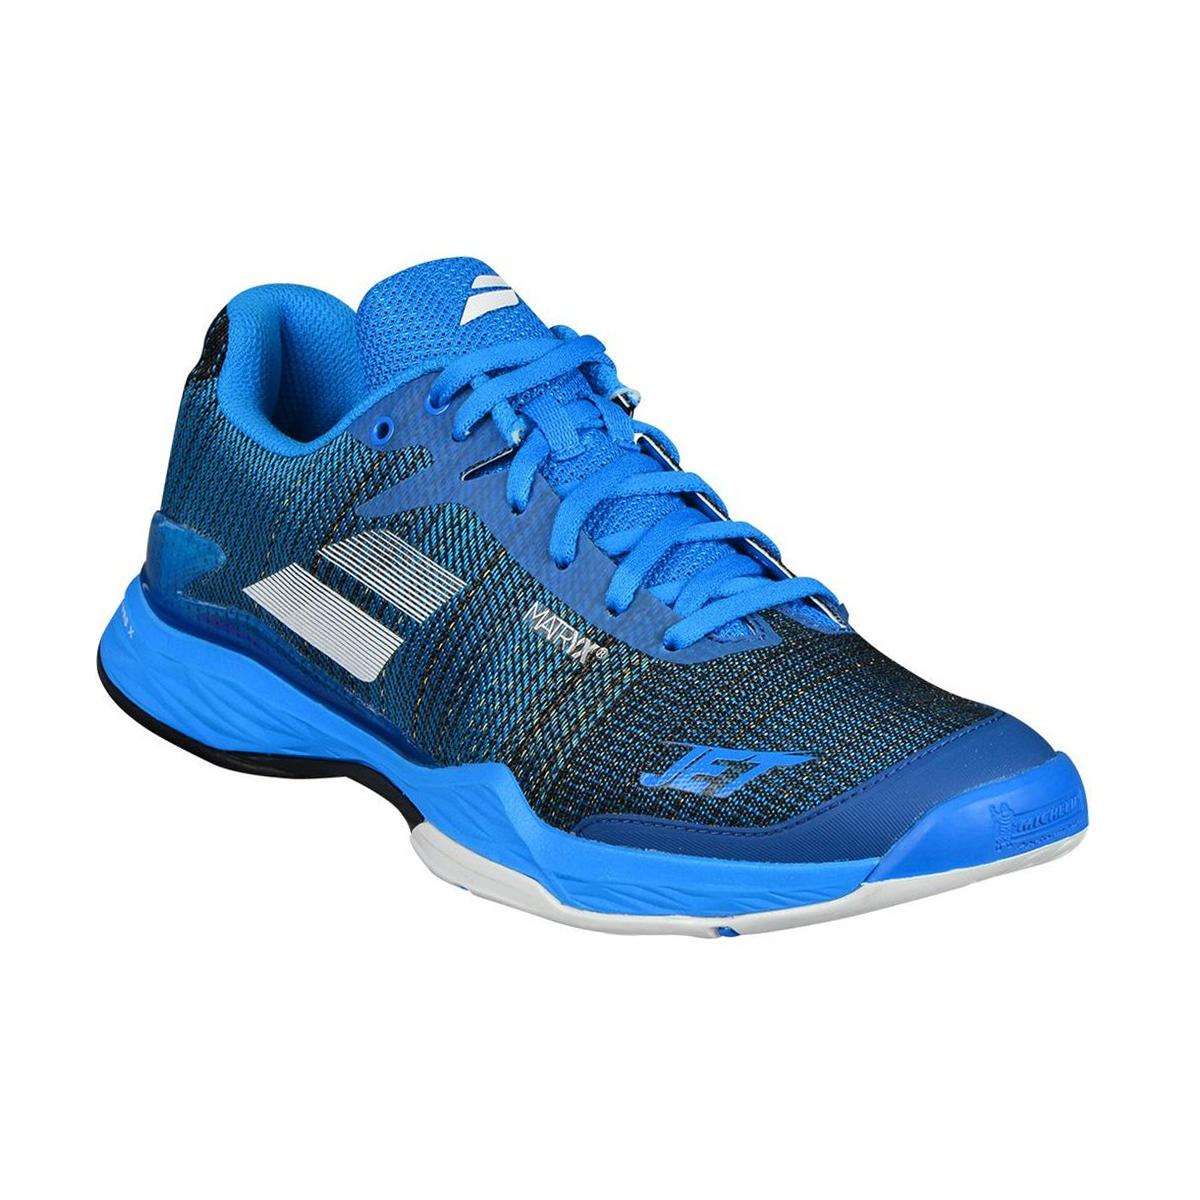 Tenis Jet Mach II All Court Azul e Branco - Babolat a279878492cf3